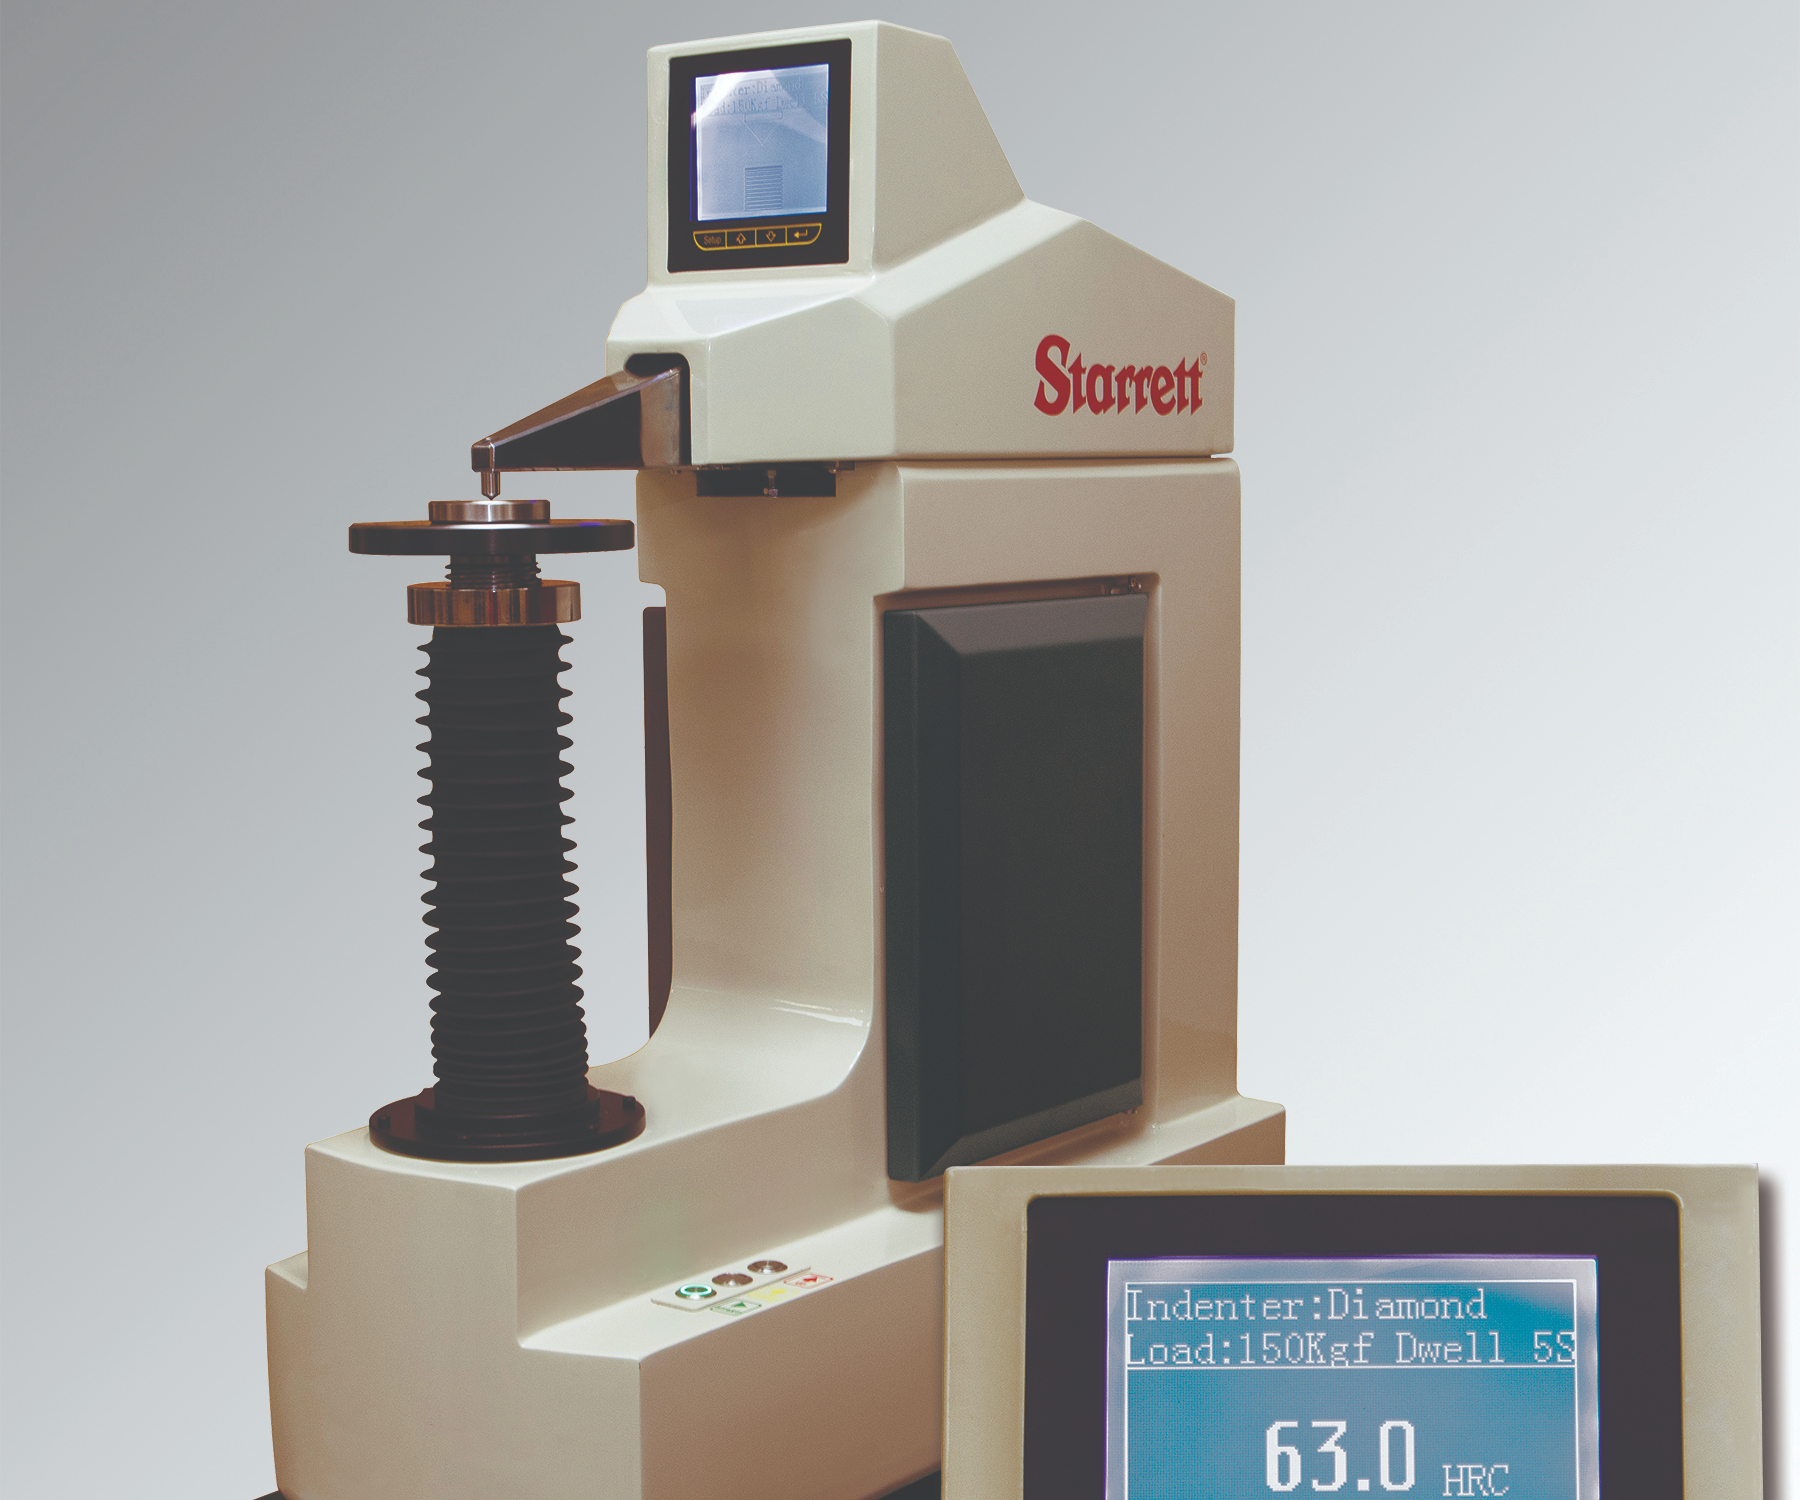 Starrett'sNo. 3824 hardness tester